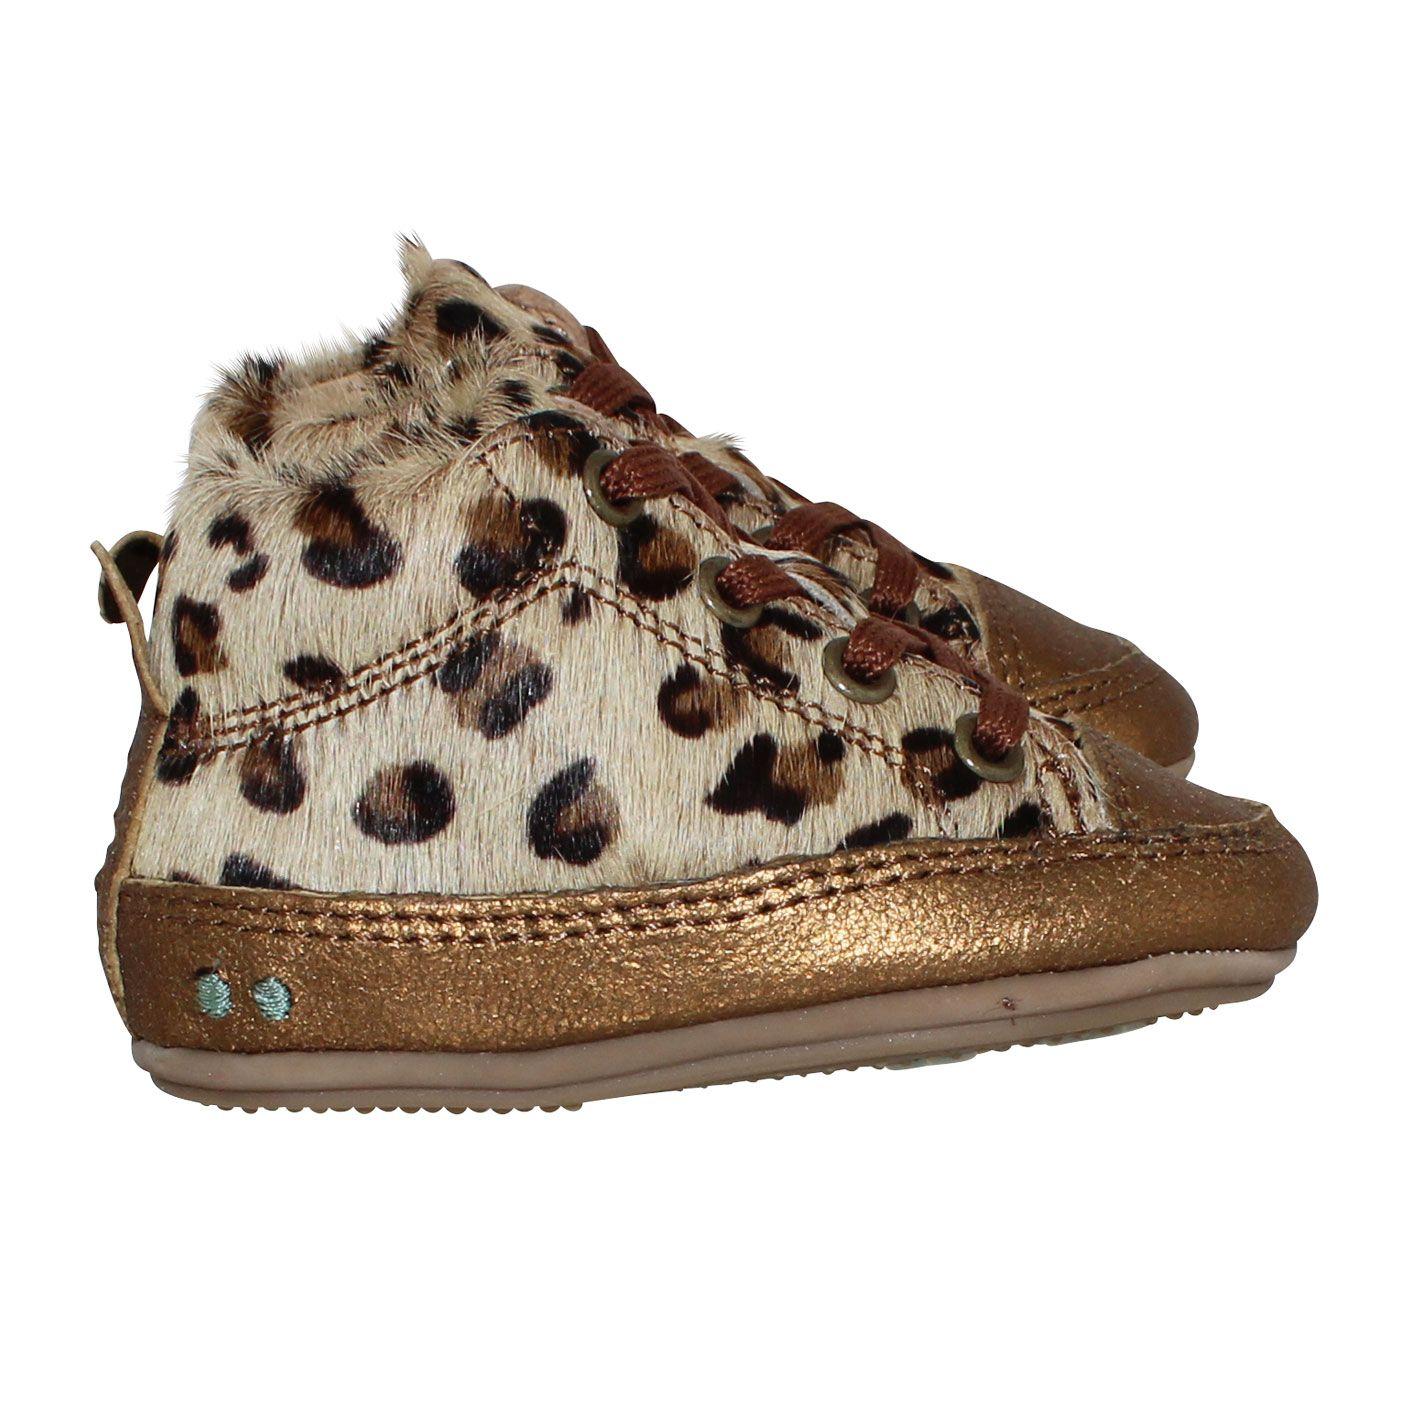 Bunnies Kinderschoenen.Zukke Zacht Leopard Kinderkleding Slippers Shoes En Bunny